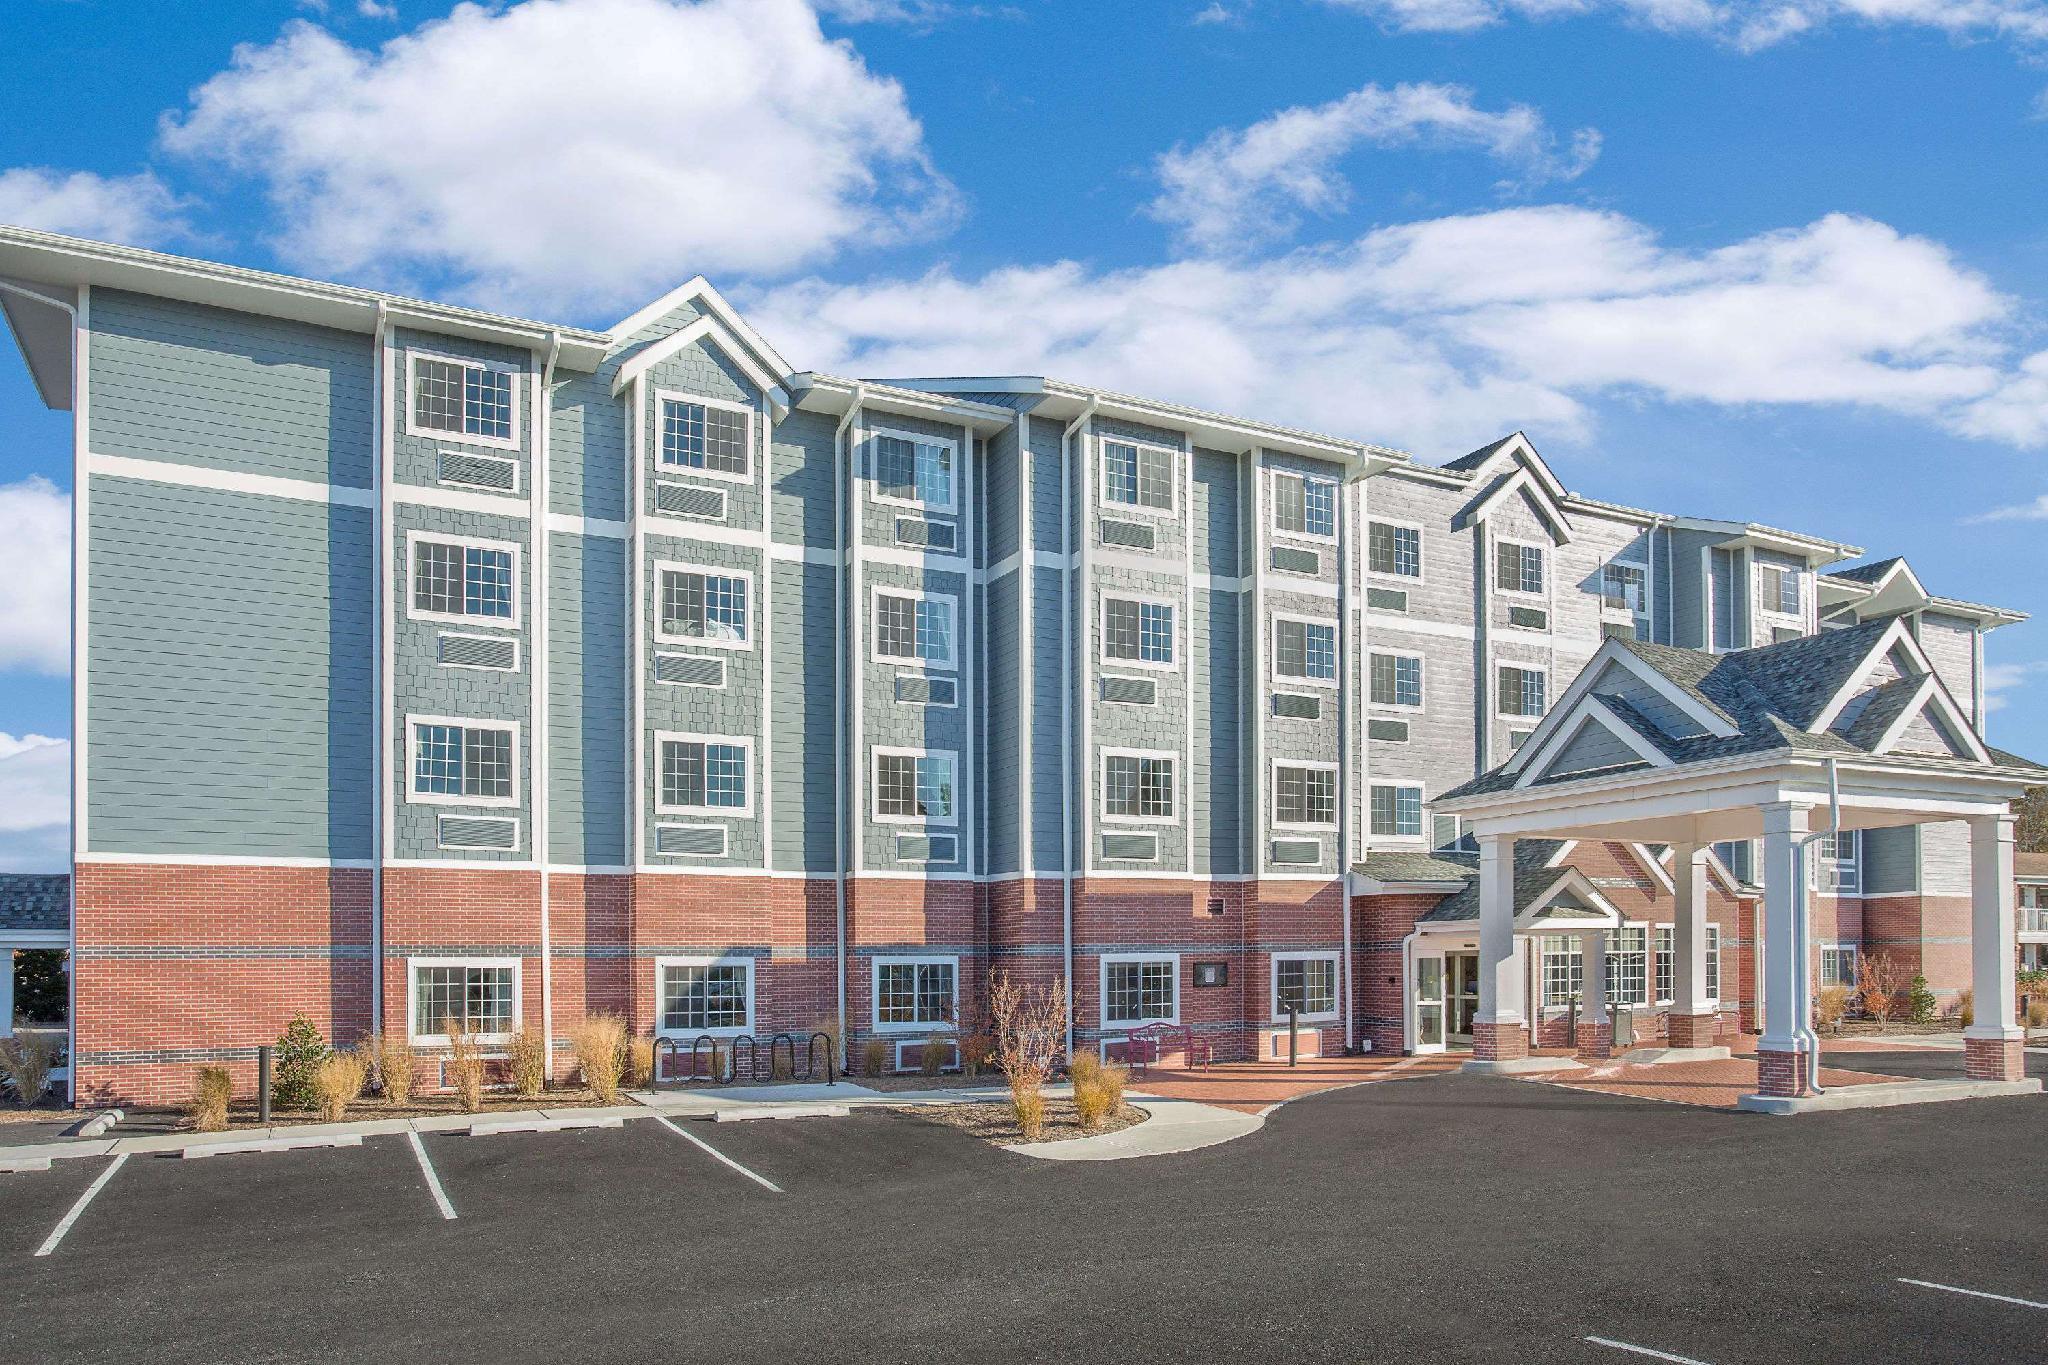 Microtel Inn And Suites By Wyndham Ocean City